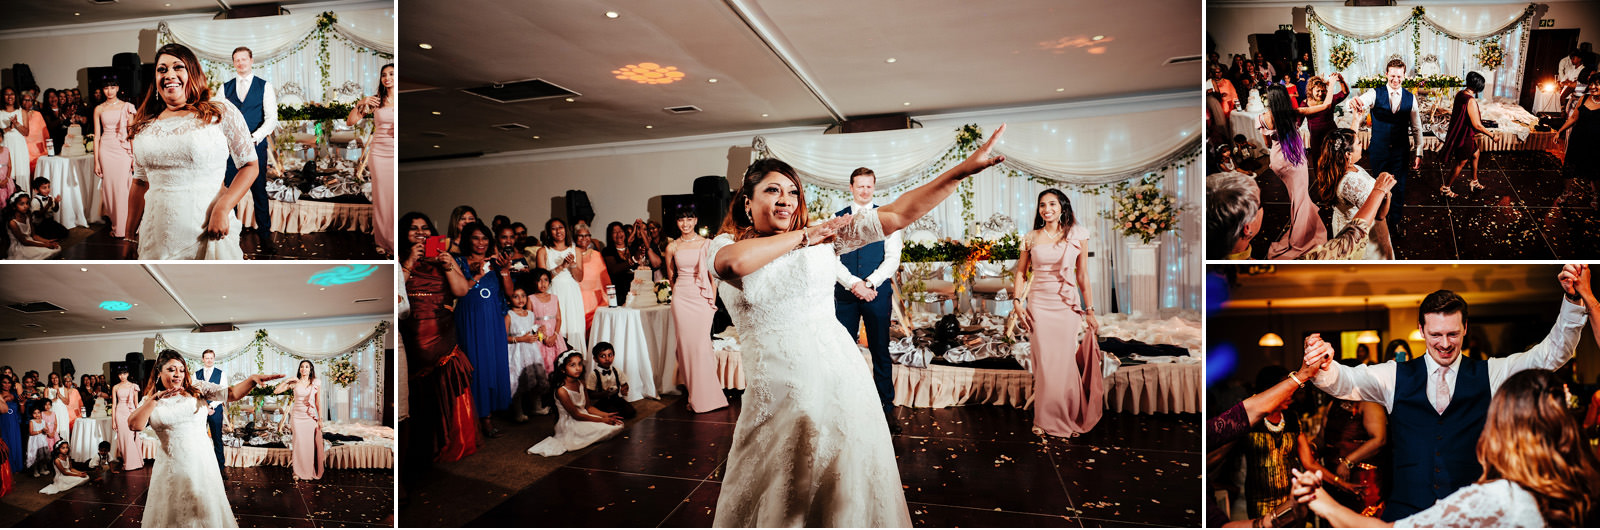 Mt_Edgecombe_Durban_Wedding_Photography_RBadal_29.jpg